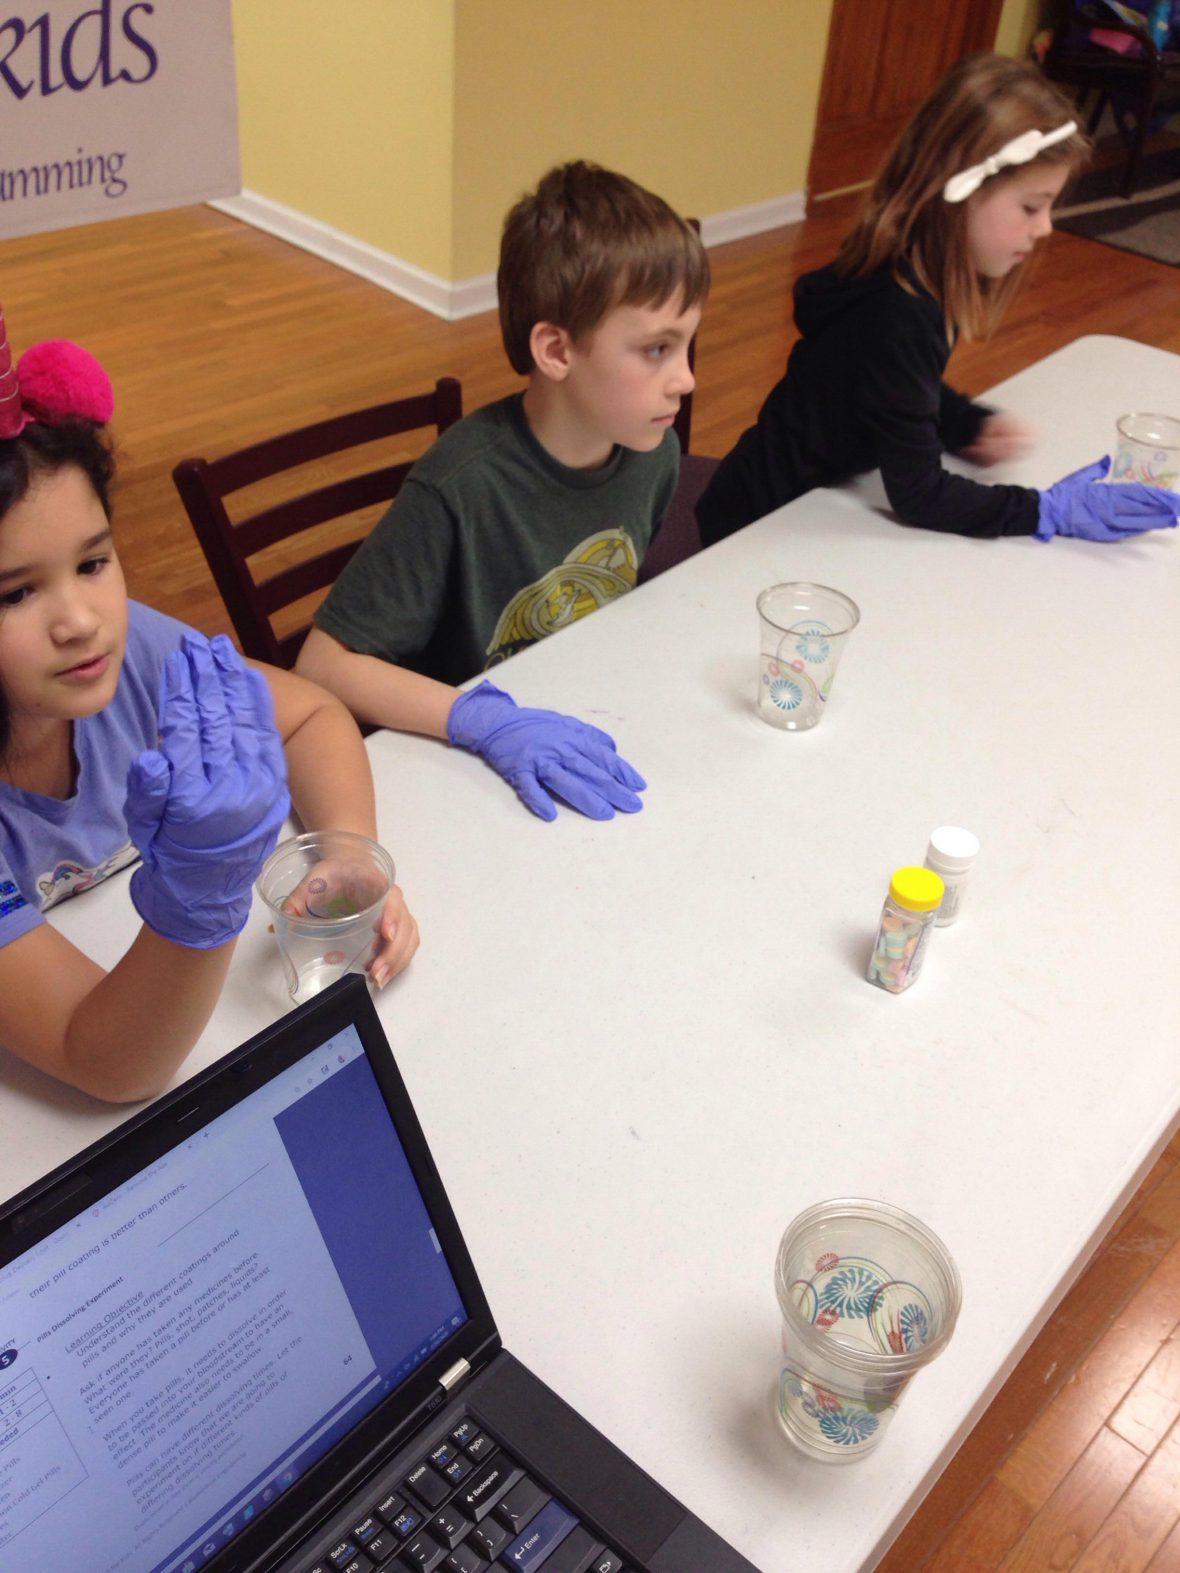 Biomedical Workshops For Kids - Fox Business - Medical Jobs